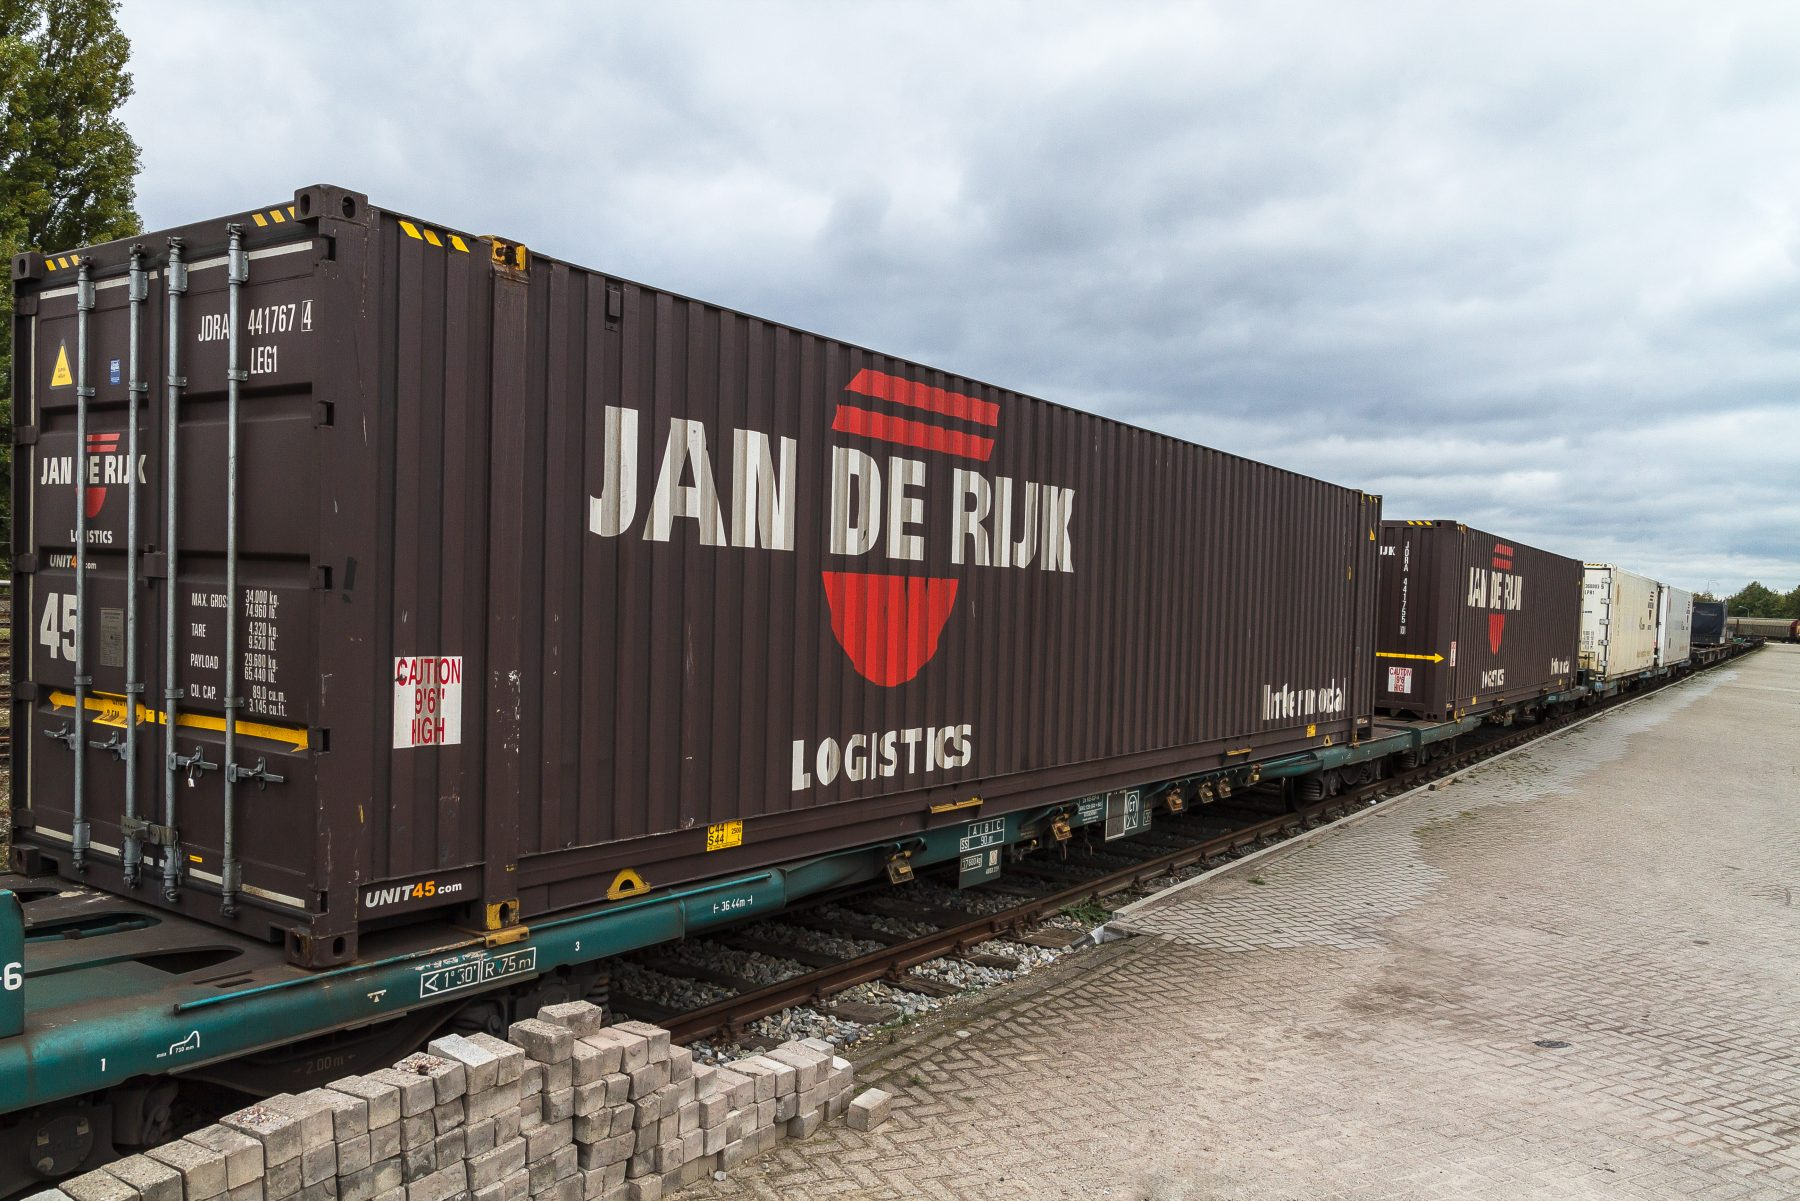 Jan de Rijk Logistics Intermodal Transport